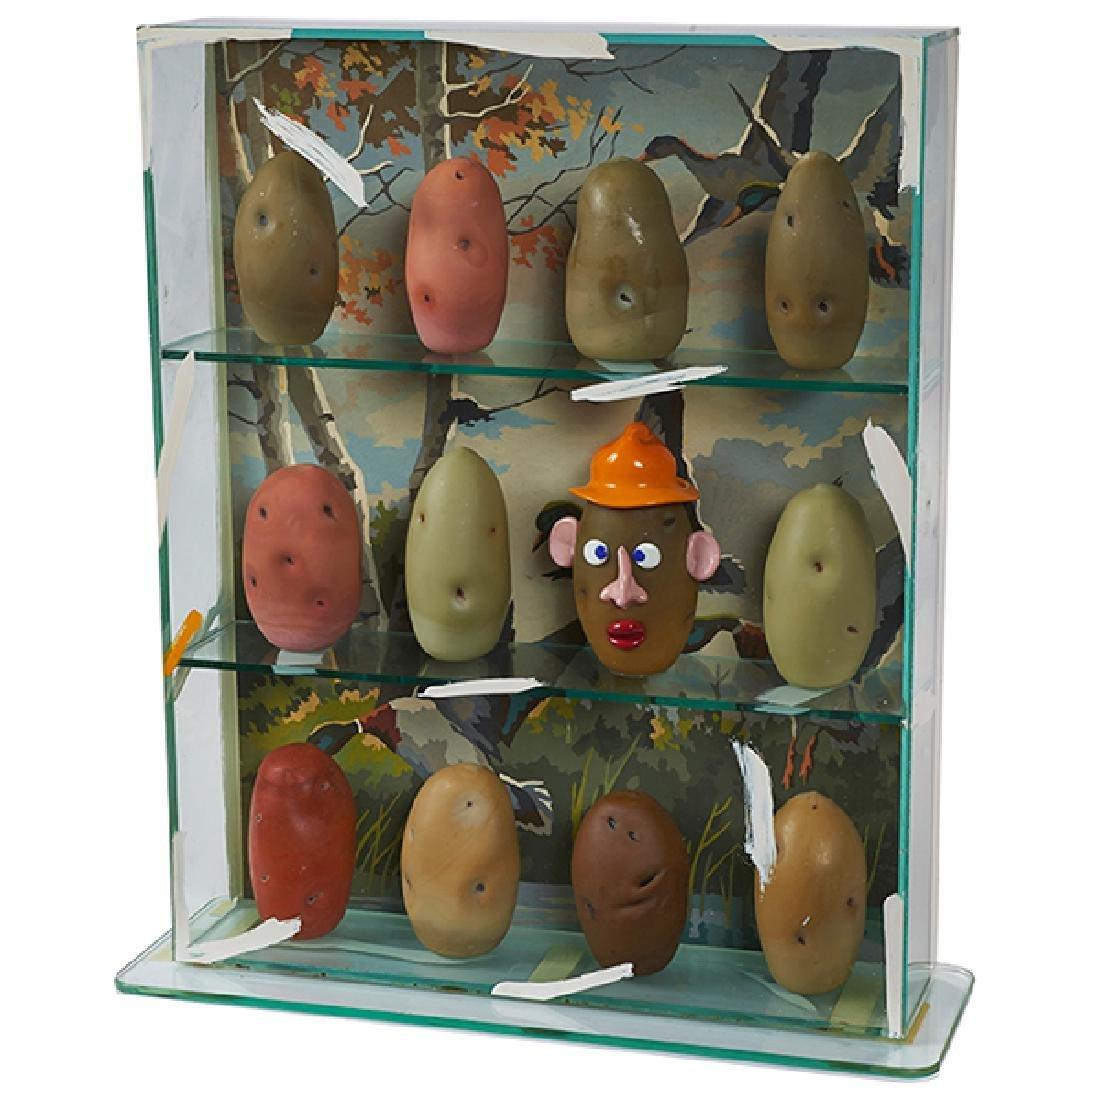 Richard Marquis, (American, b. 1945), Potato Head Box